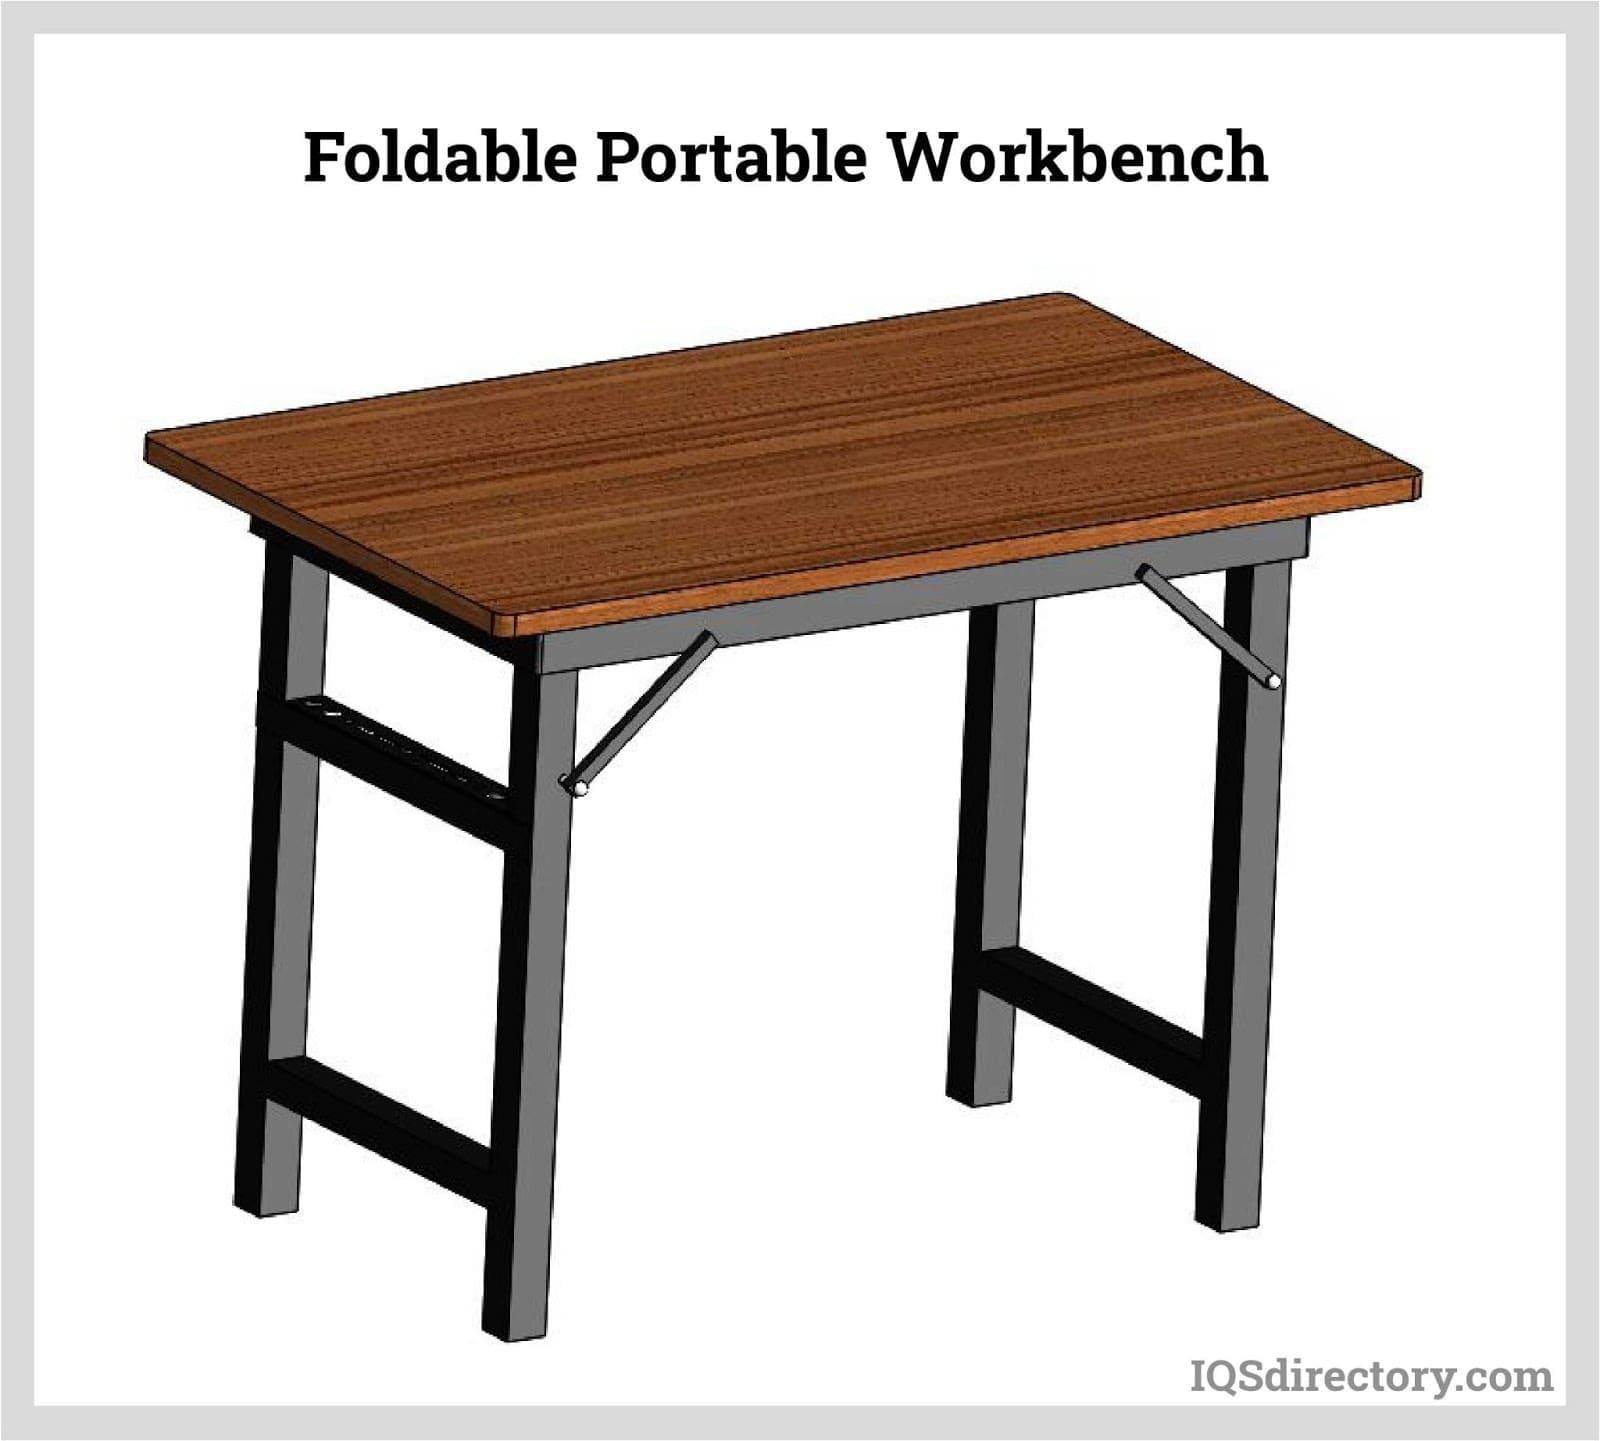 Foldable Portable Workbench